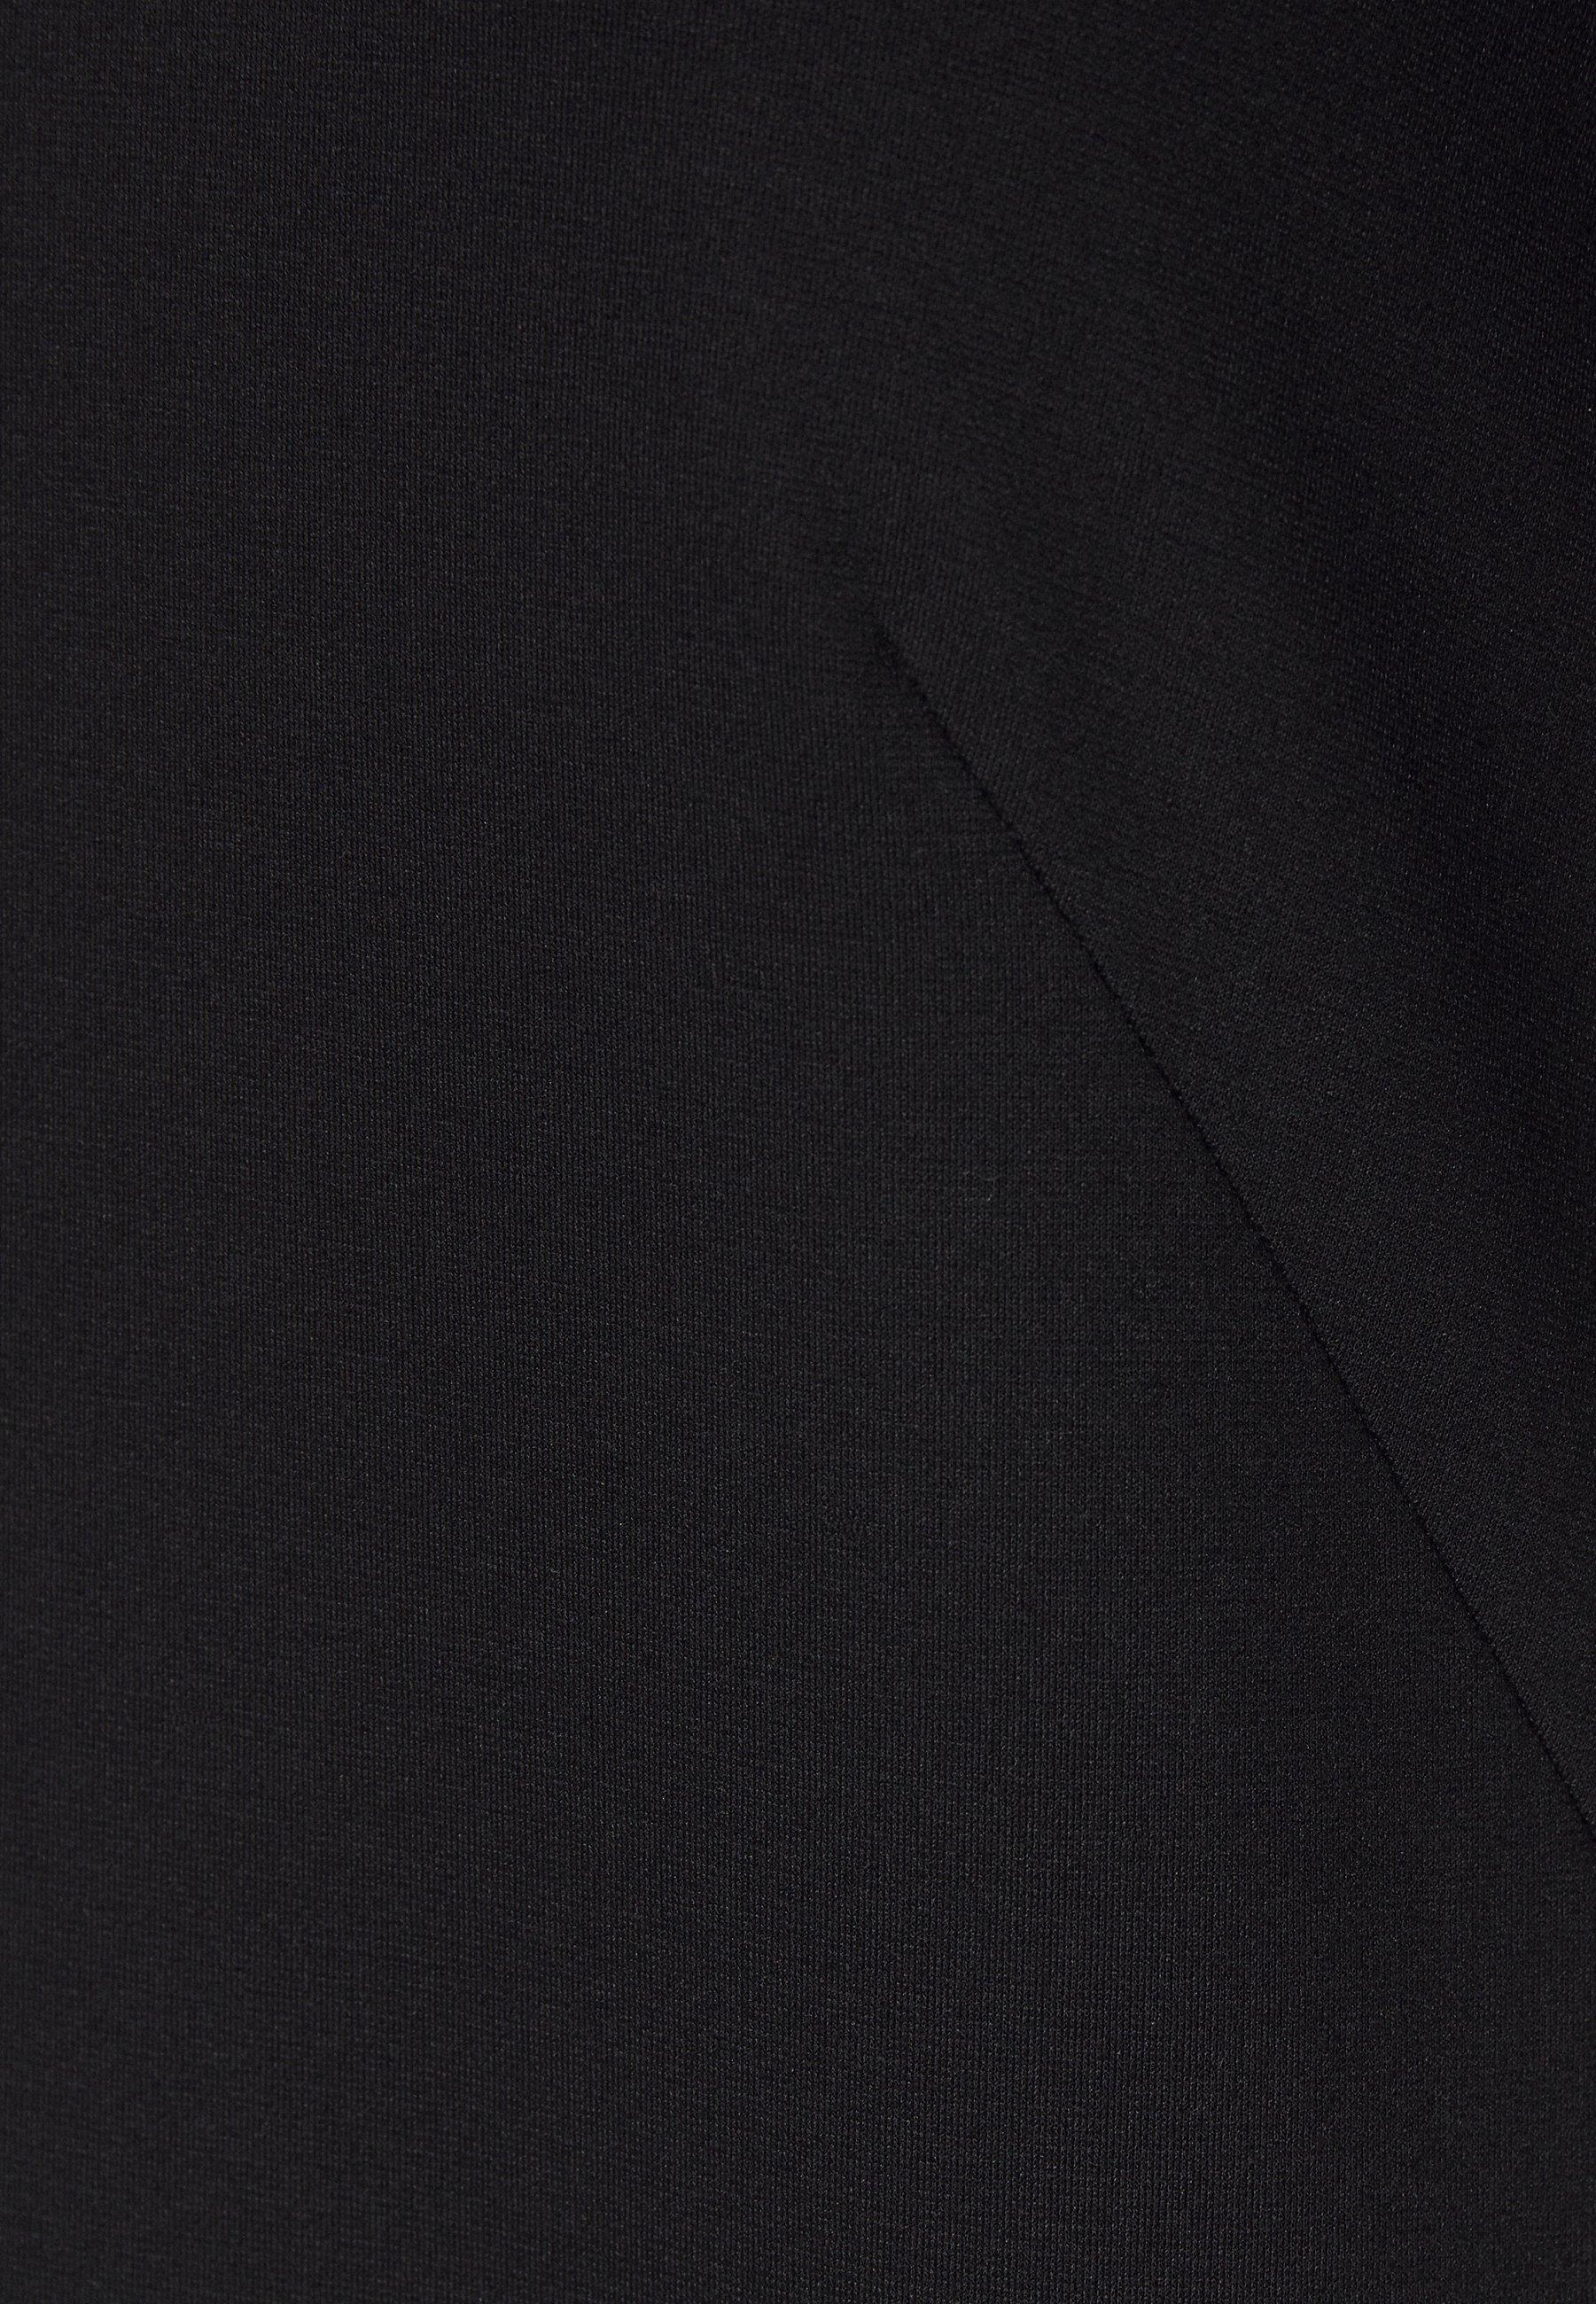 New Lower Prices Women's Clothing RIANI Jersey dress black V0TU1zLJ2